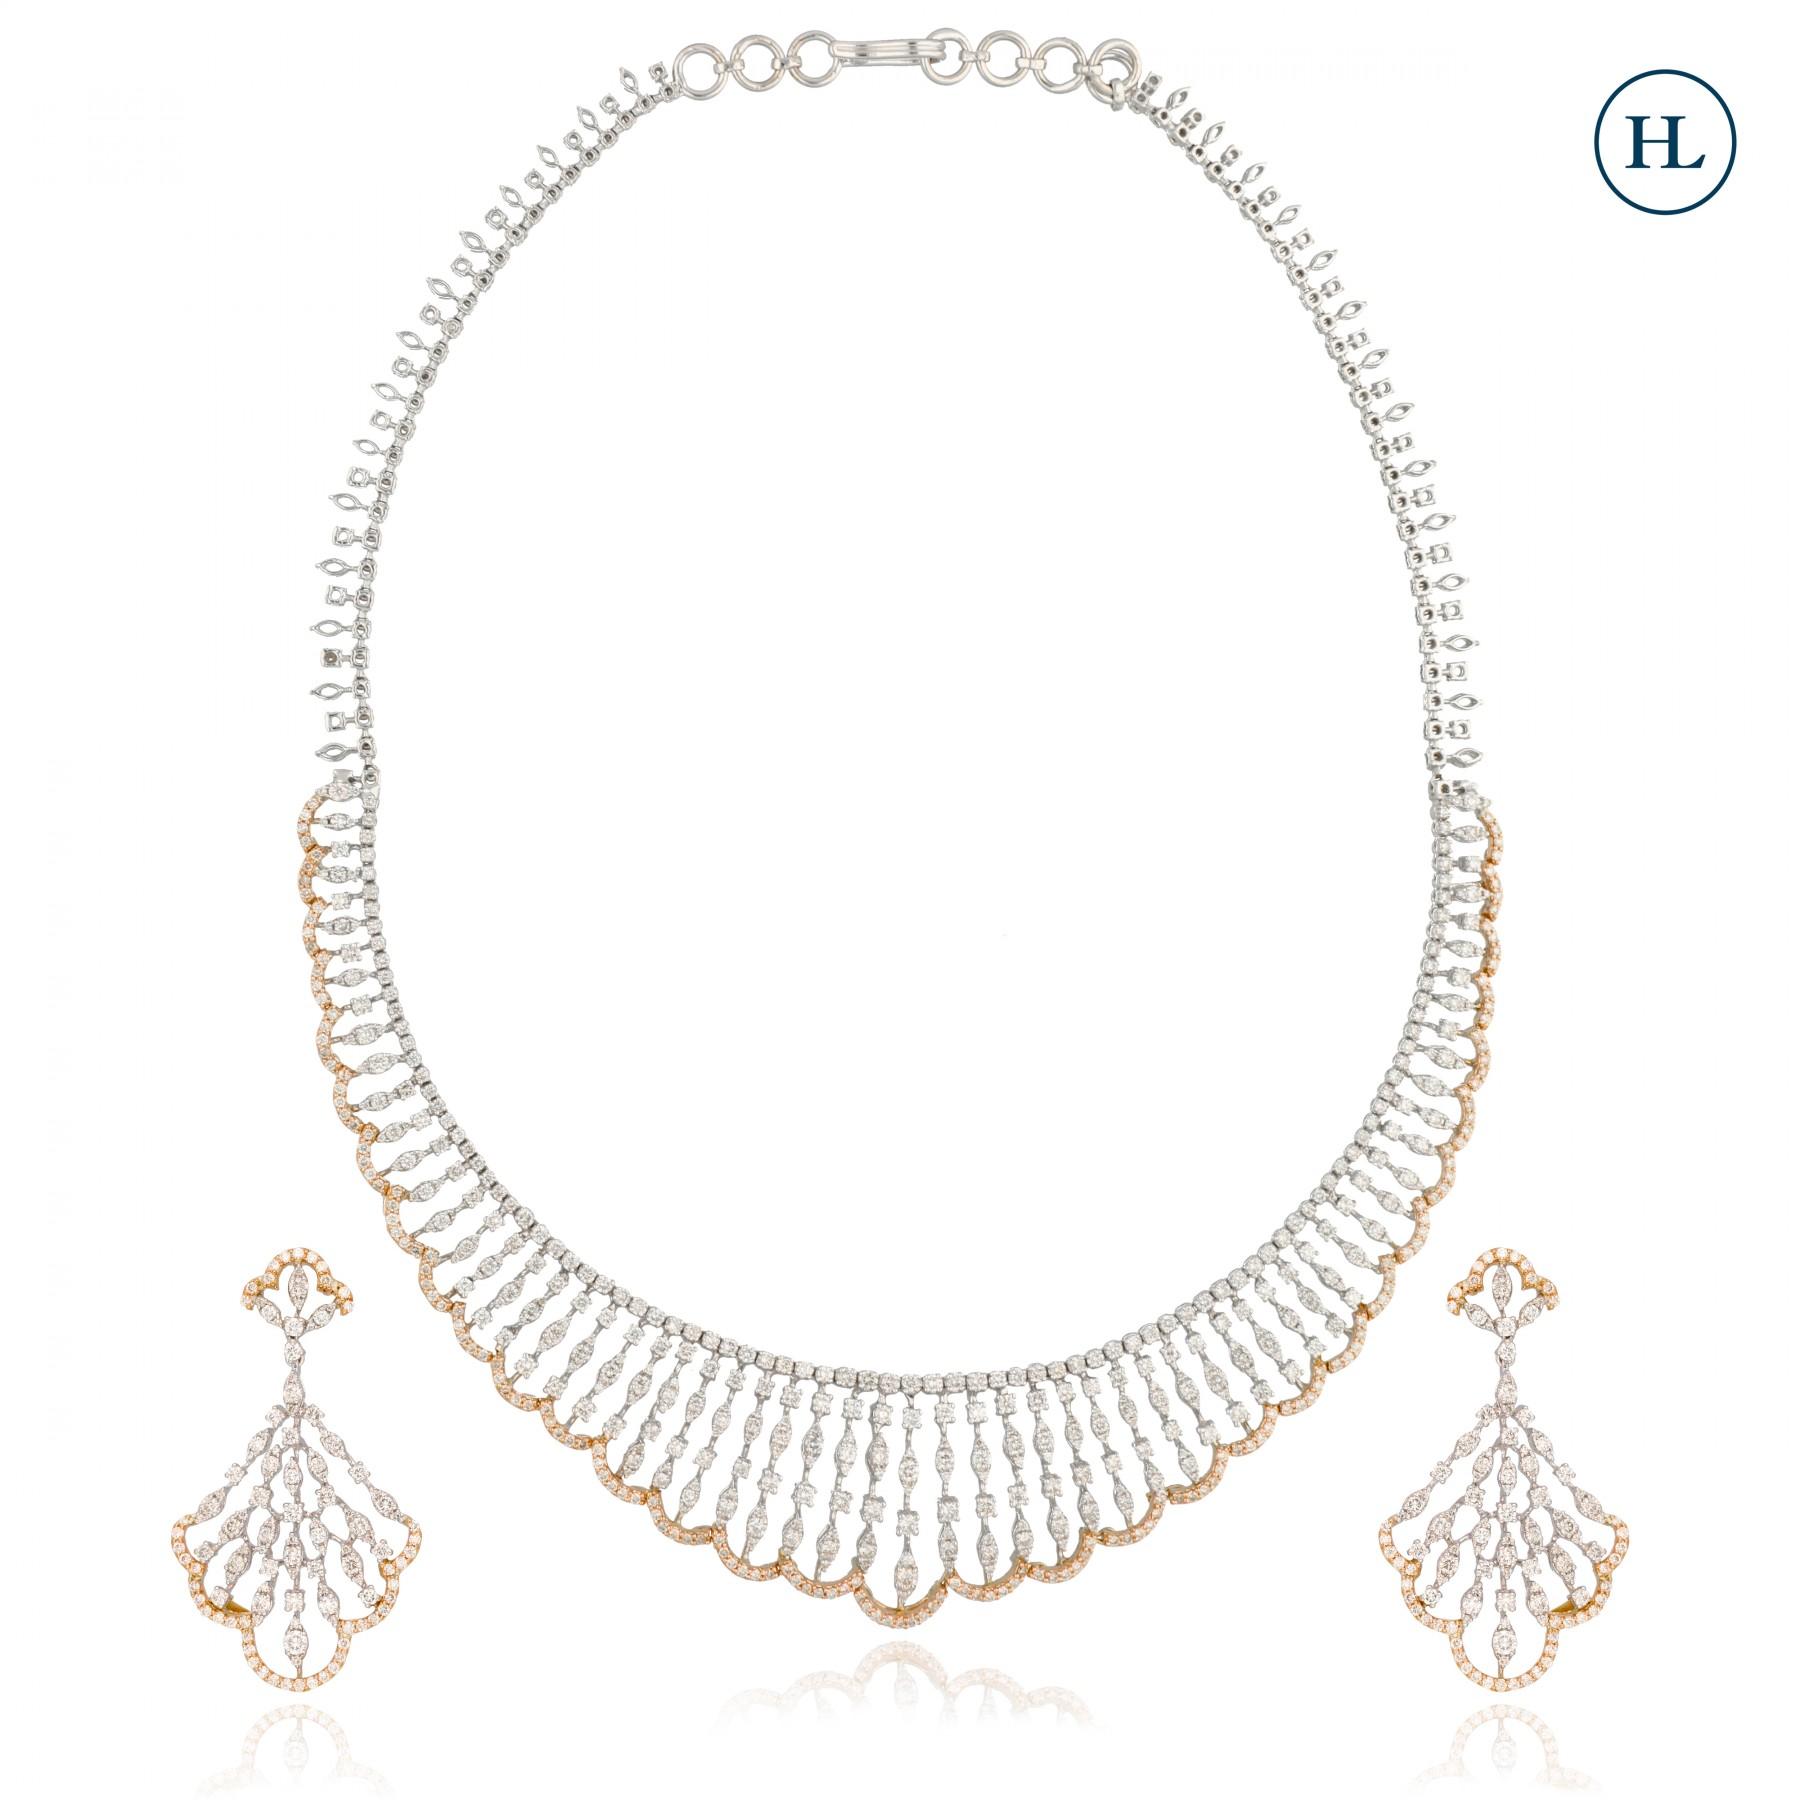 Spikes Diamond Necklace Set